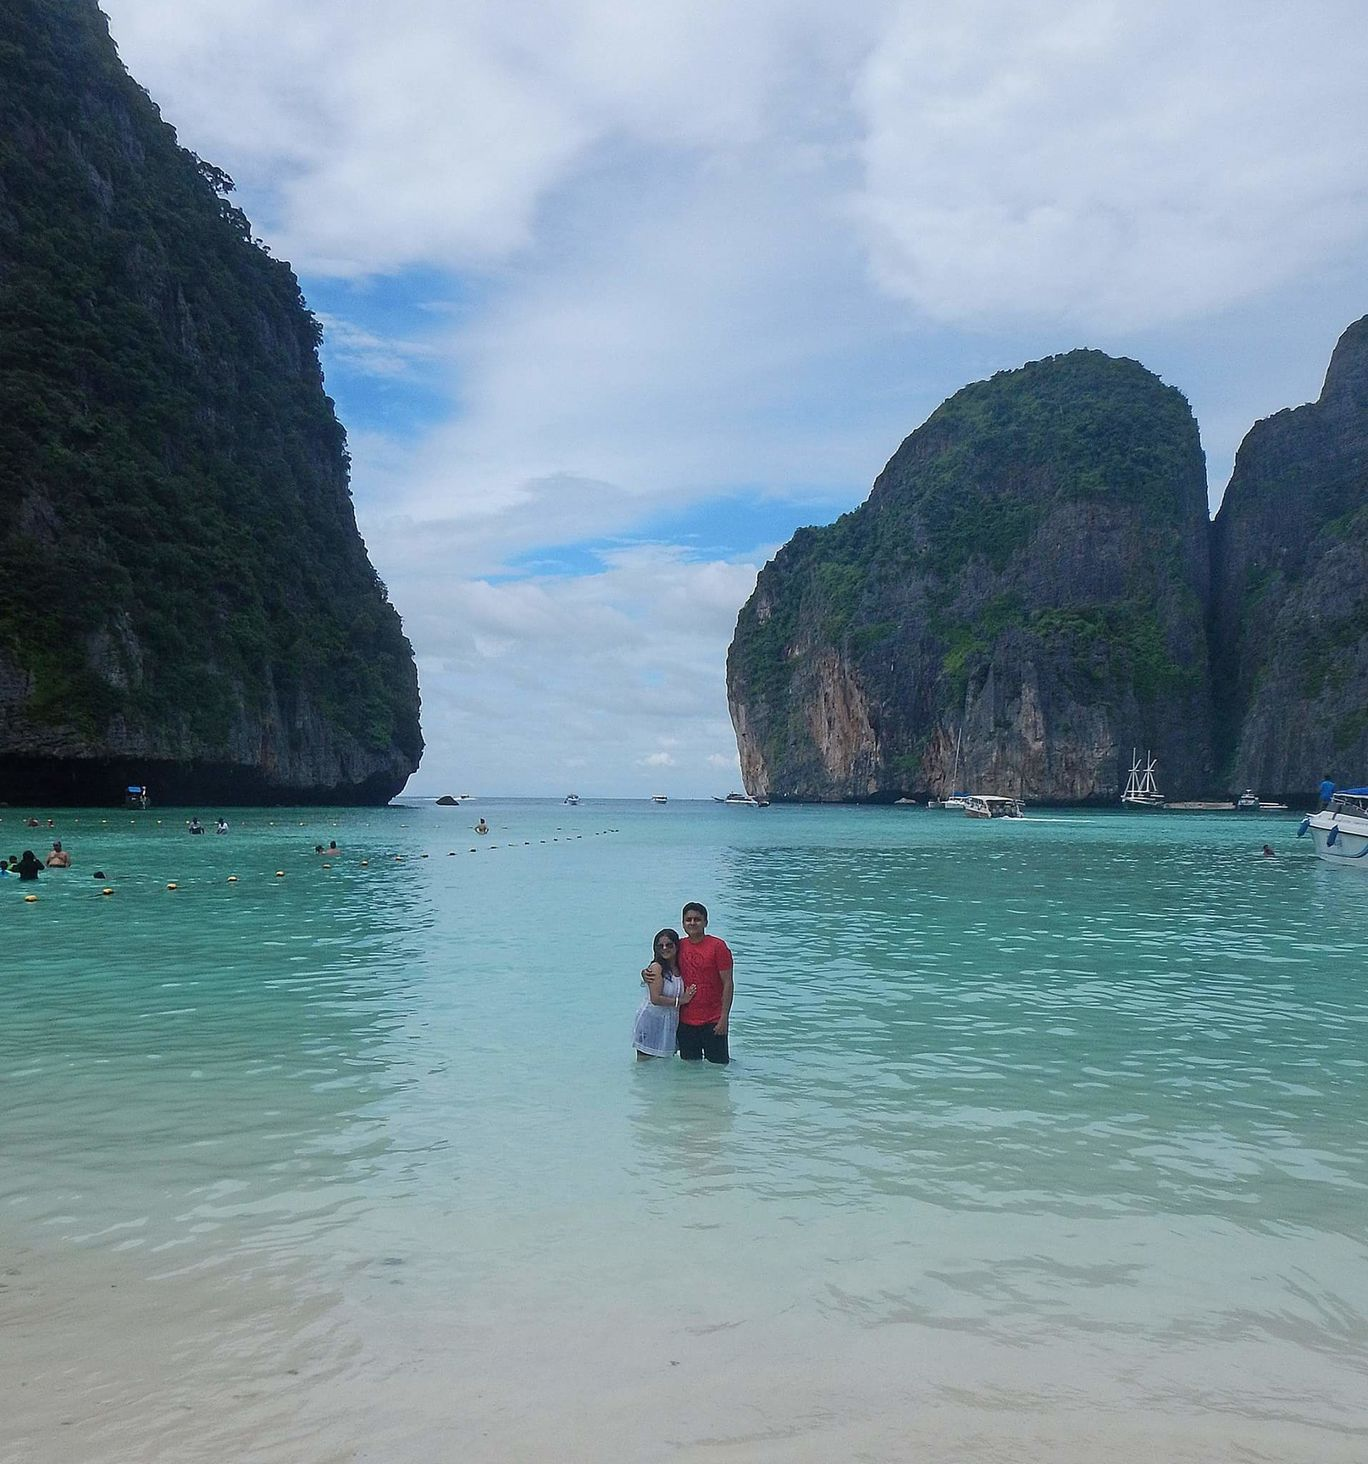 Photo of Phi Phi Islands By Birat Dutta Bhaumik